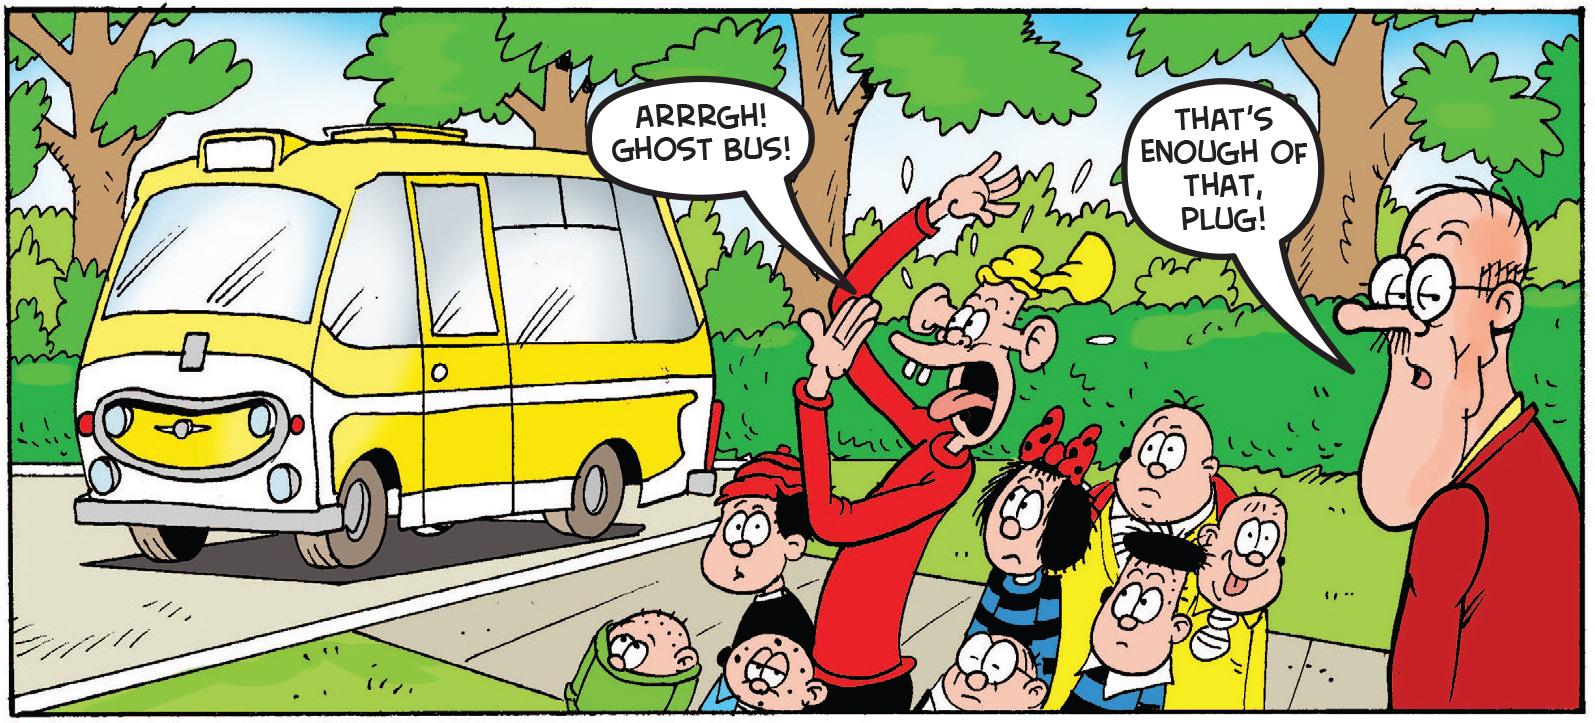 Plug sees the school bus